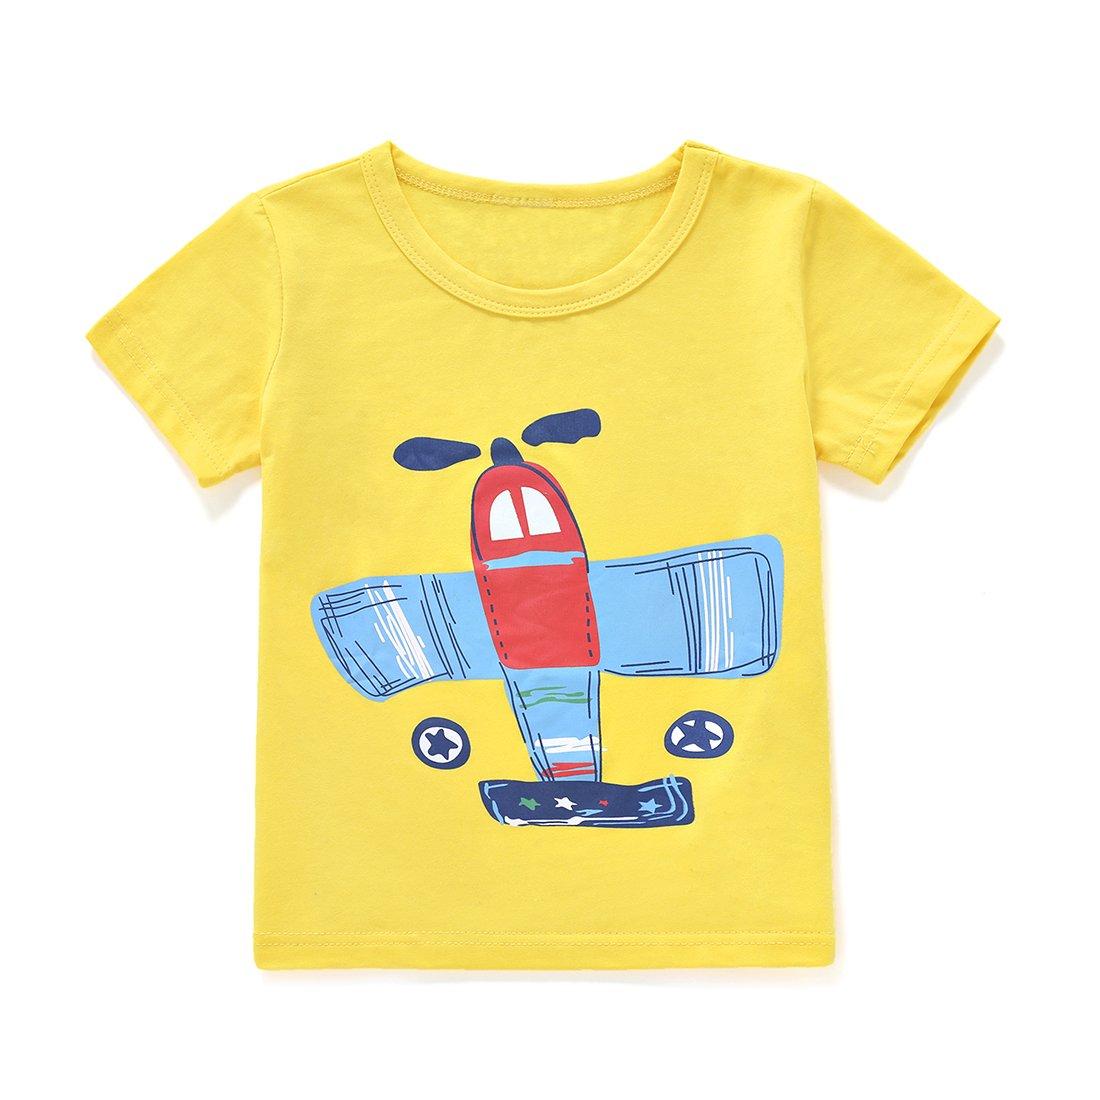 1d016f00a00c Amazon.com  ChicNChic Baby Boys Short Sleeve T-Shirts Shorts Set 2pcs  Cartoon Plane Summer Outfits Clothing  Clothing